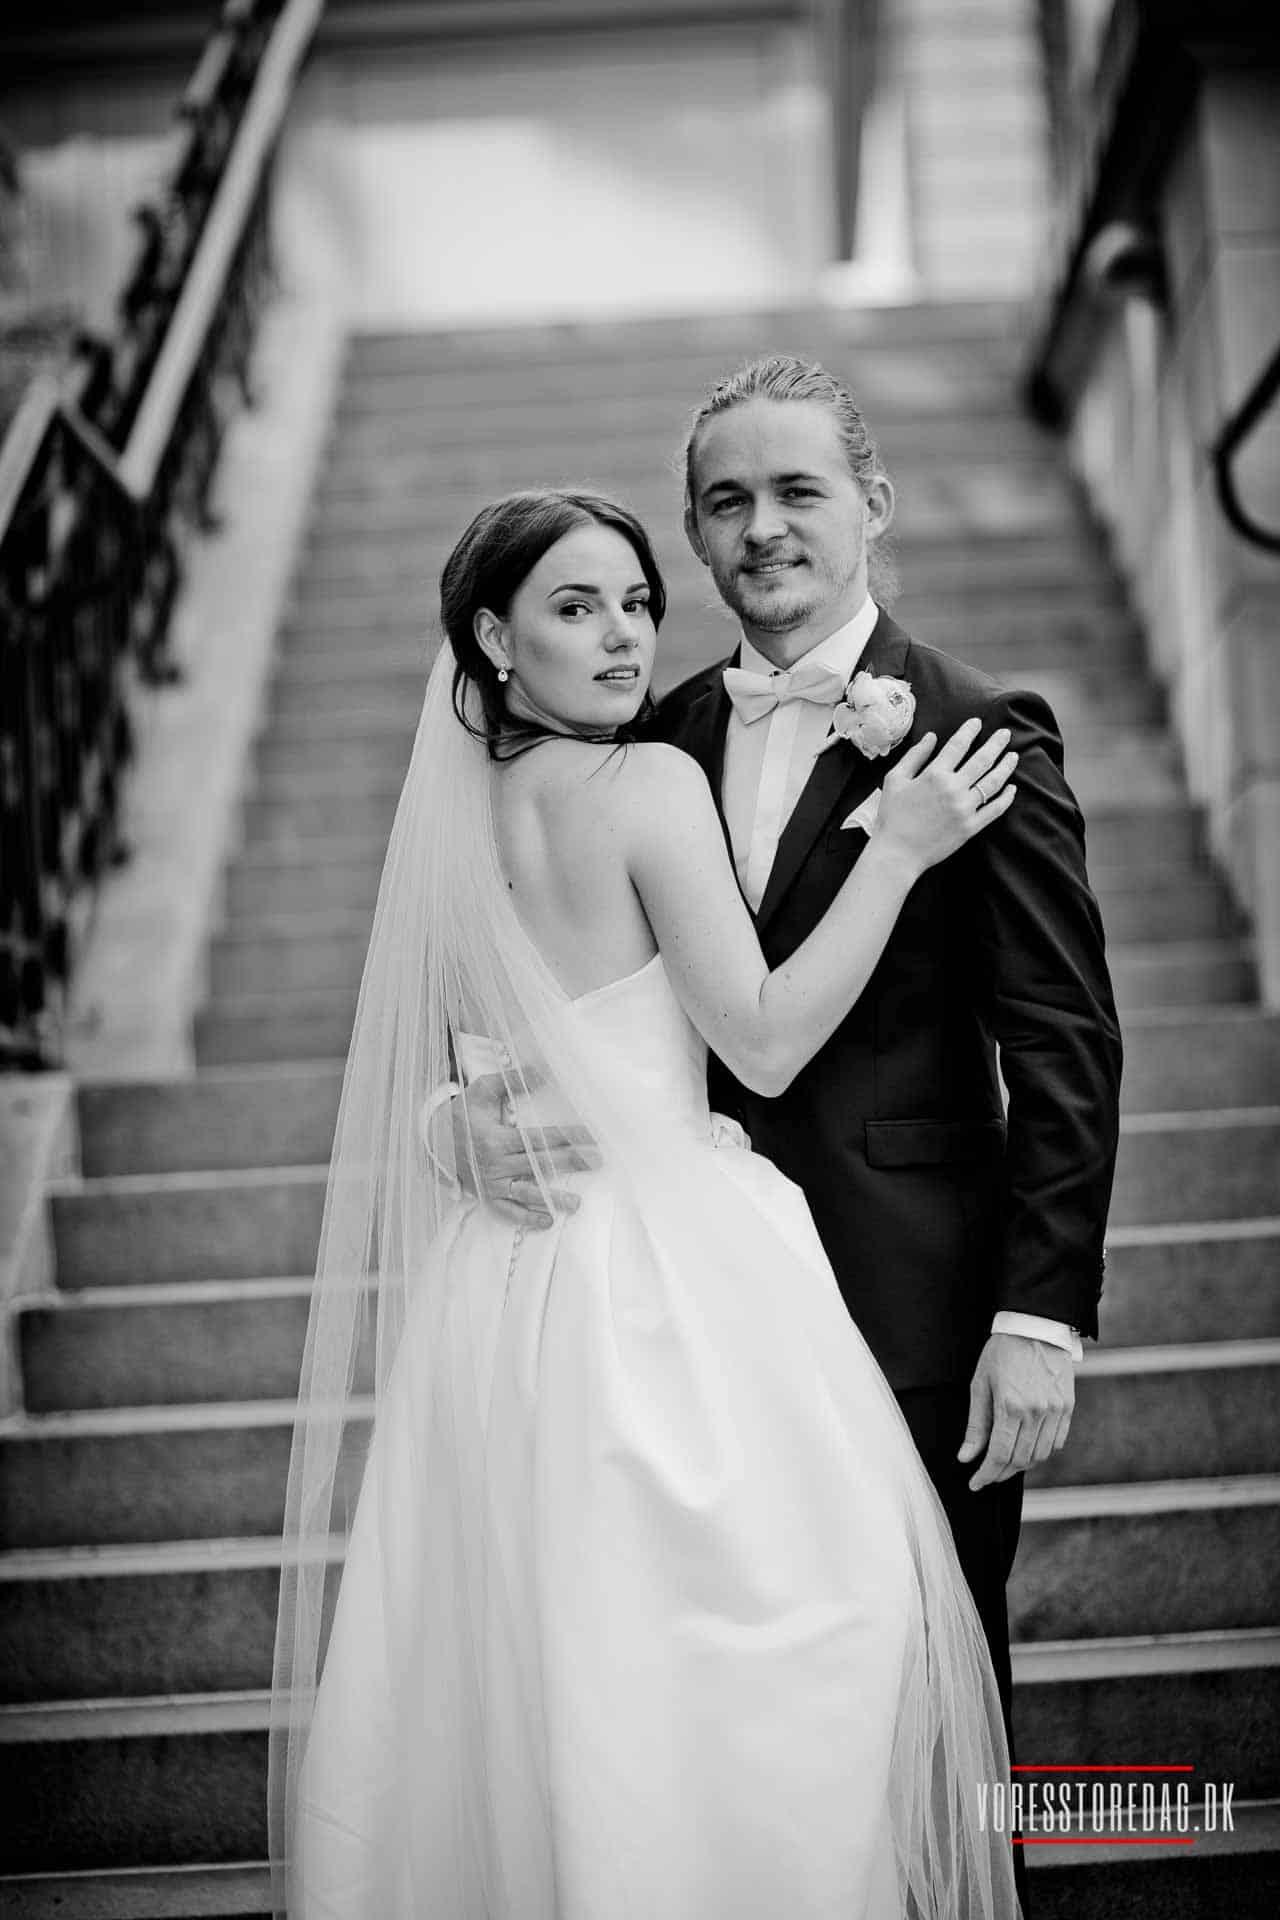 Kolding bryllup. ... Hotel Koldingfjord